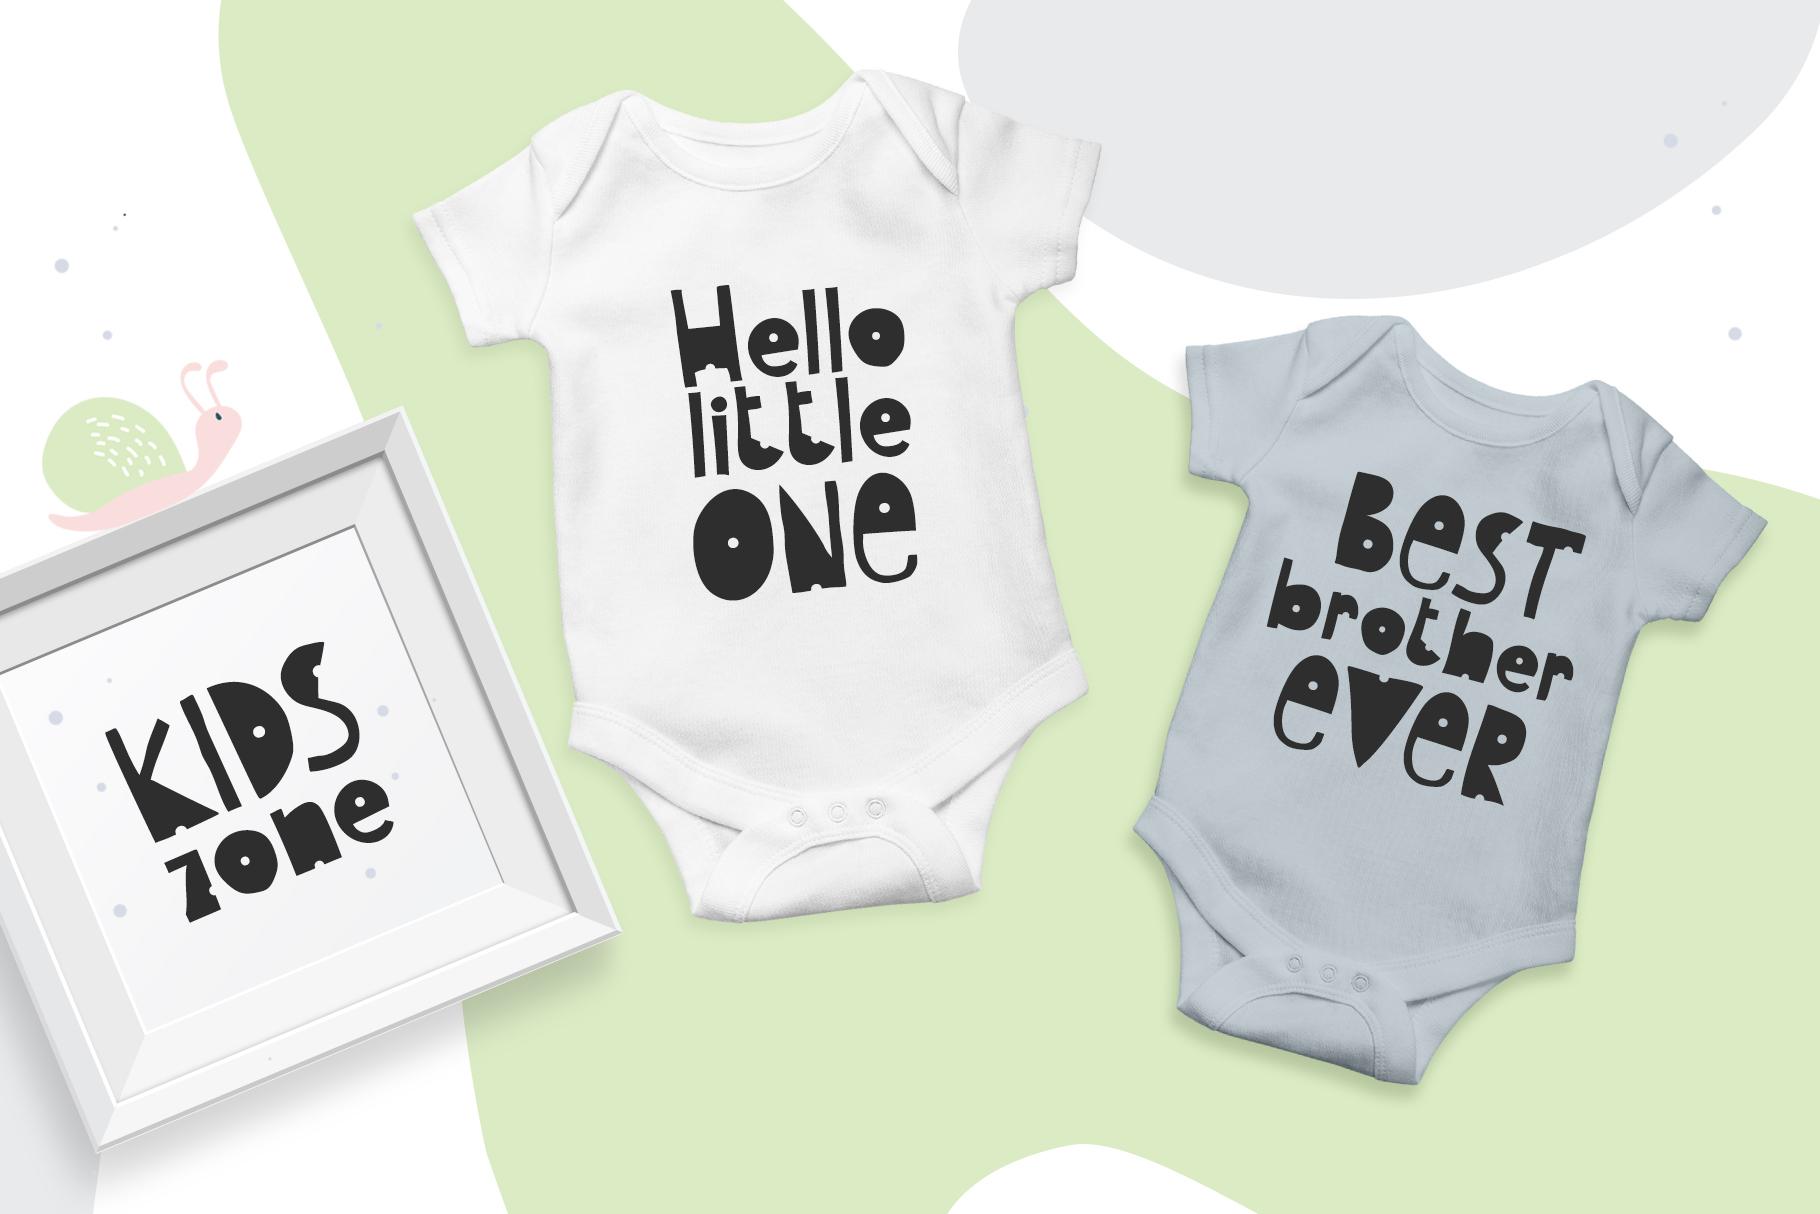 Kids Handwriting Font 2021: Hello Baby Childish Font - title06 2